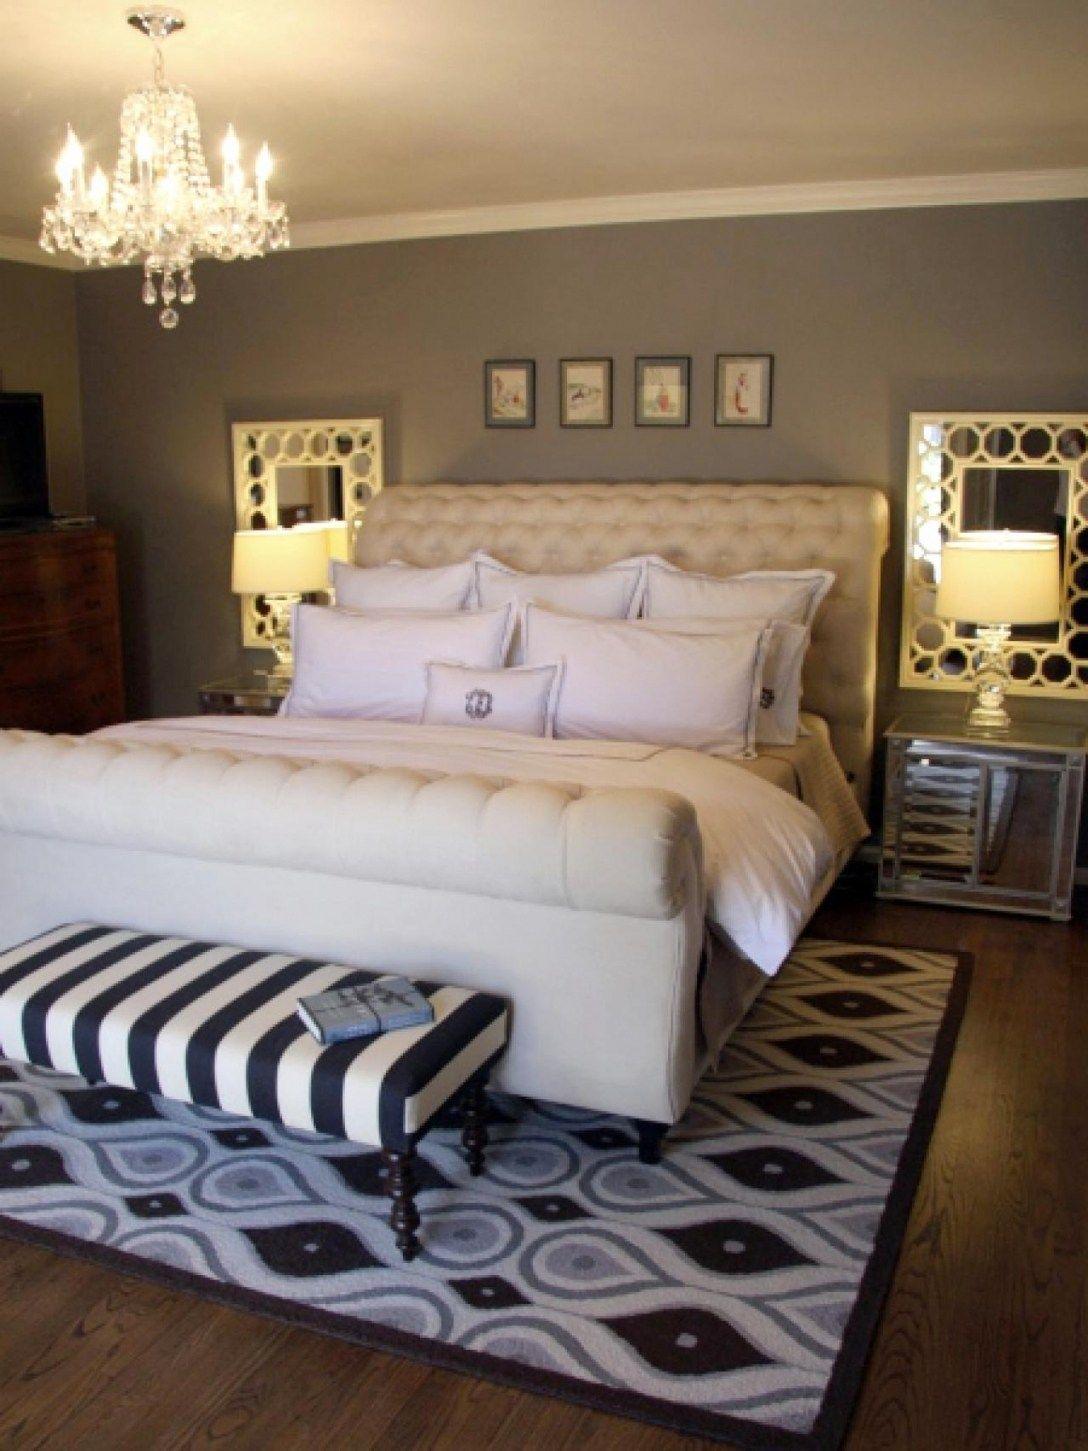 Couples Bedroom Designs Entrancing Top 10 Modern Bedroom Decorating Ideas For Couples Top 10 Modern 2018